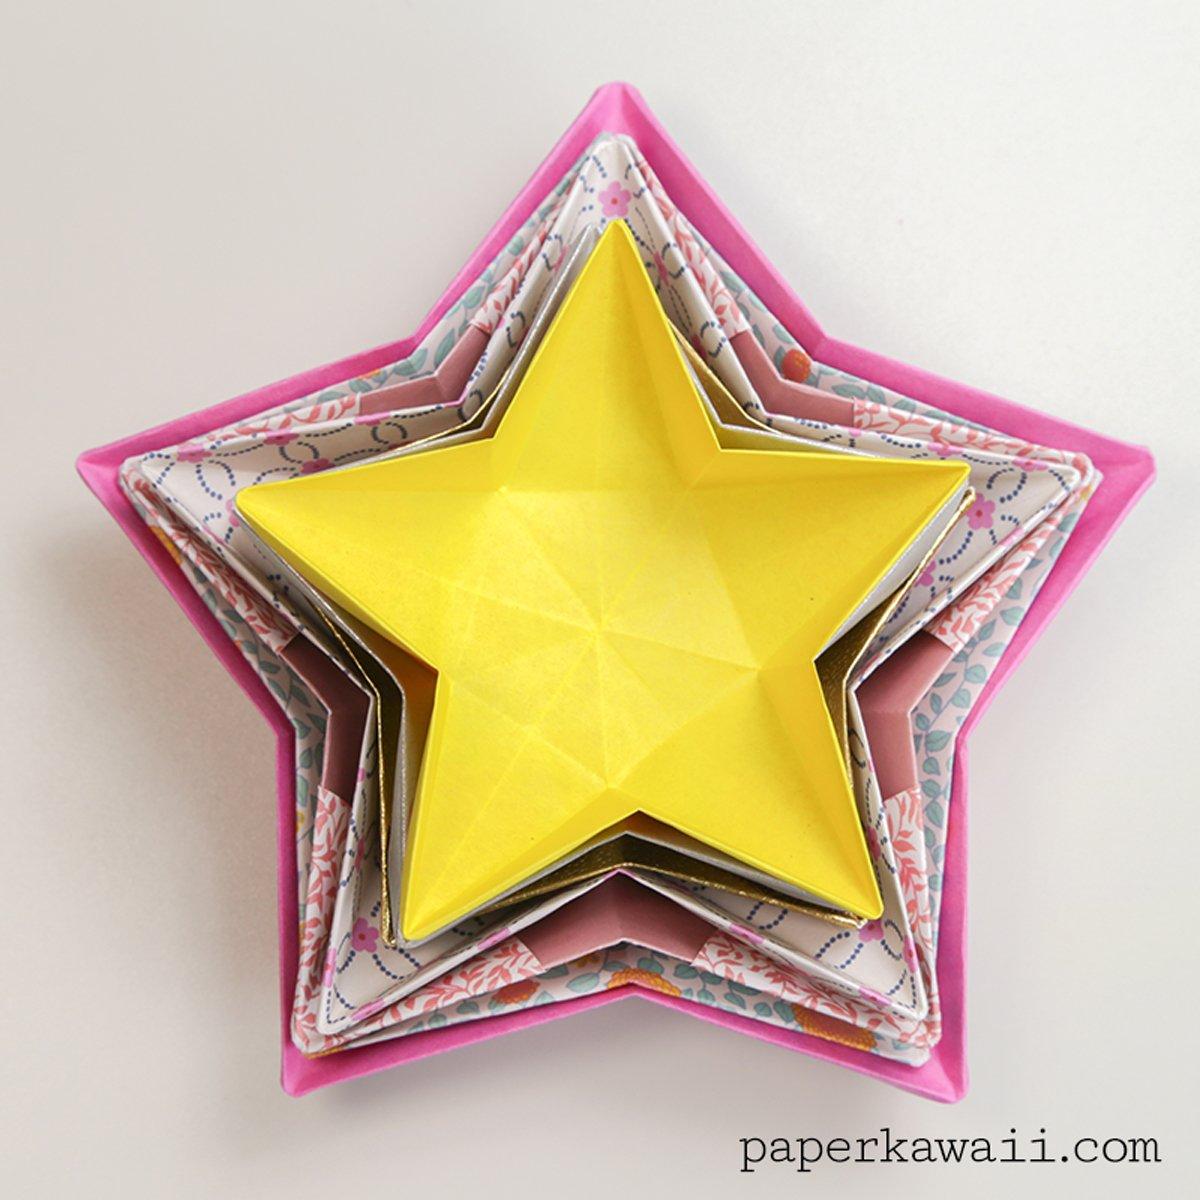 Origami Star Bowl Instructions - Paper Kawaii - photo#21